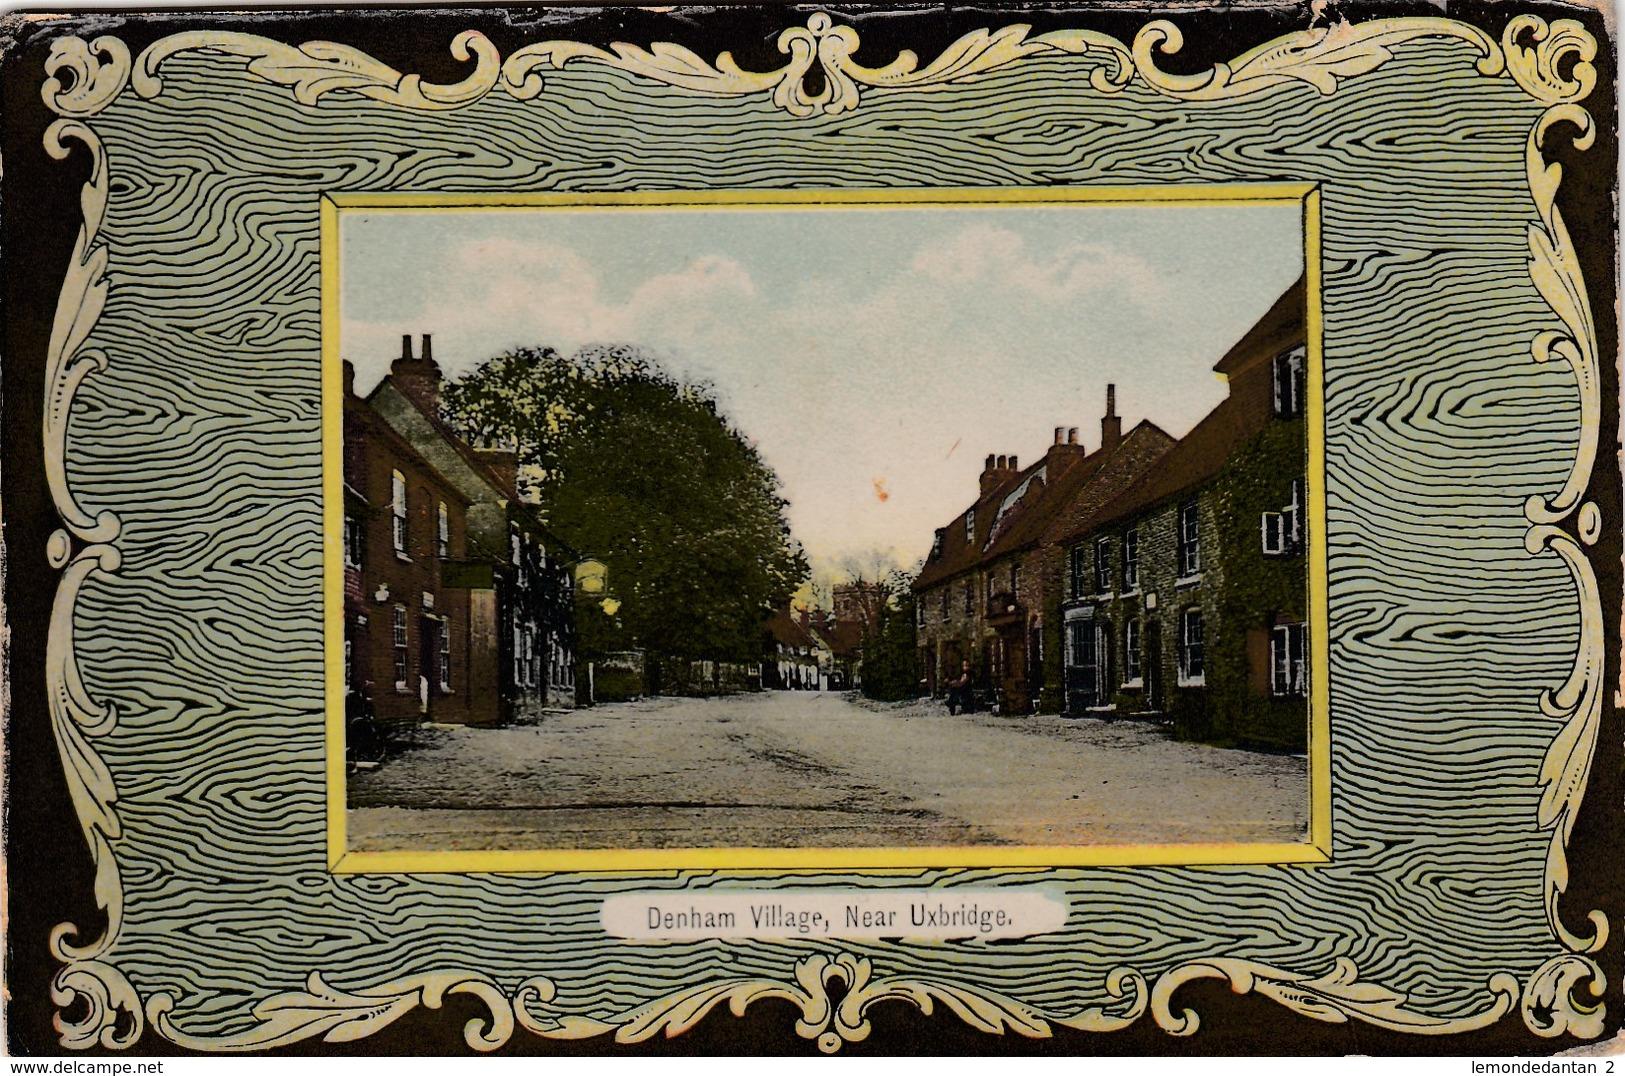 Denham Village - Near Uxbridge - Buckinghamshire